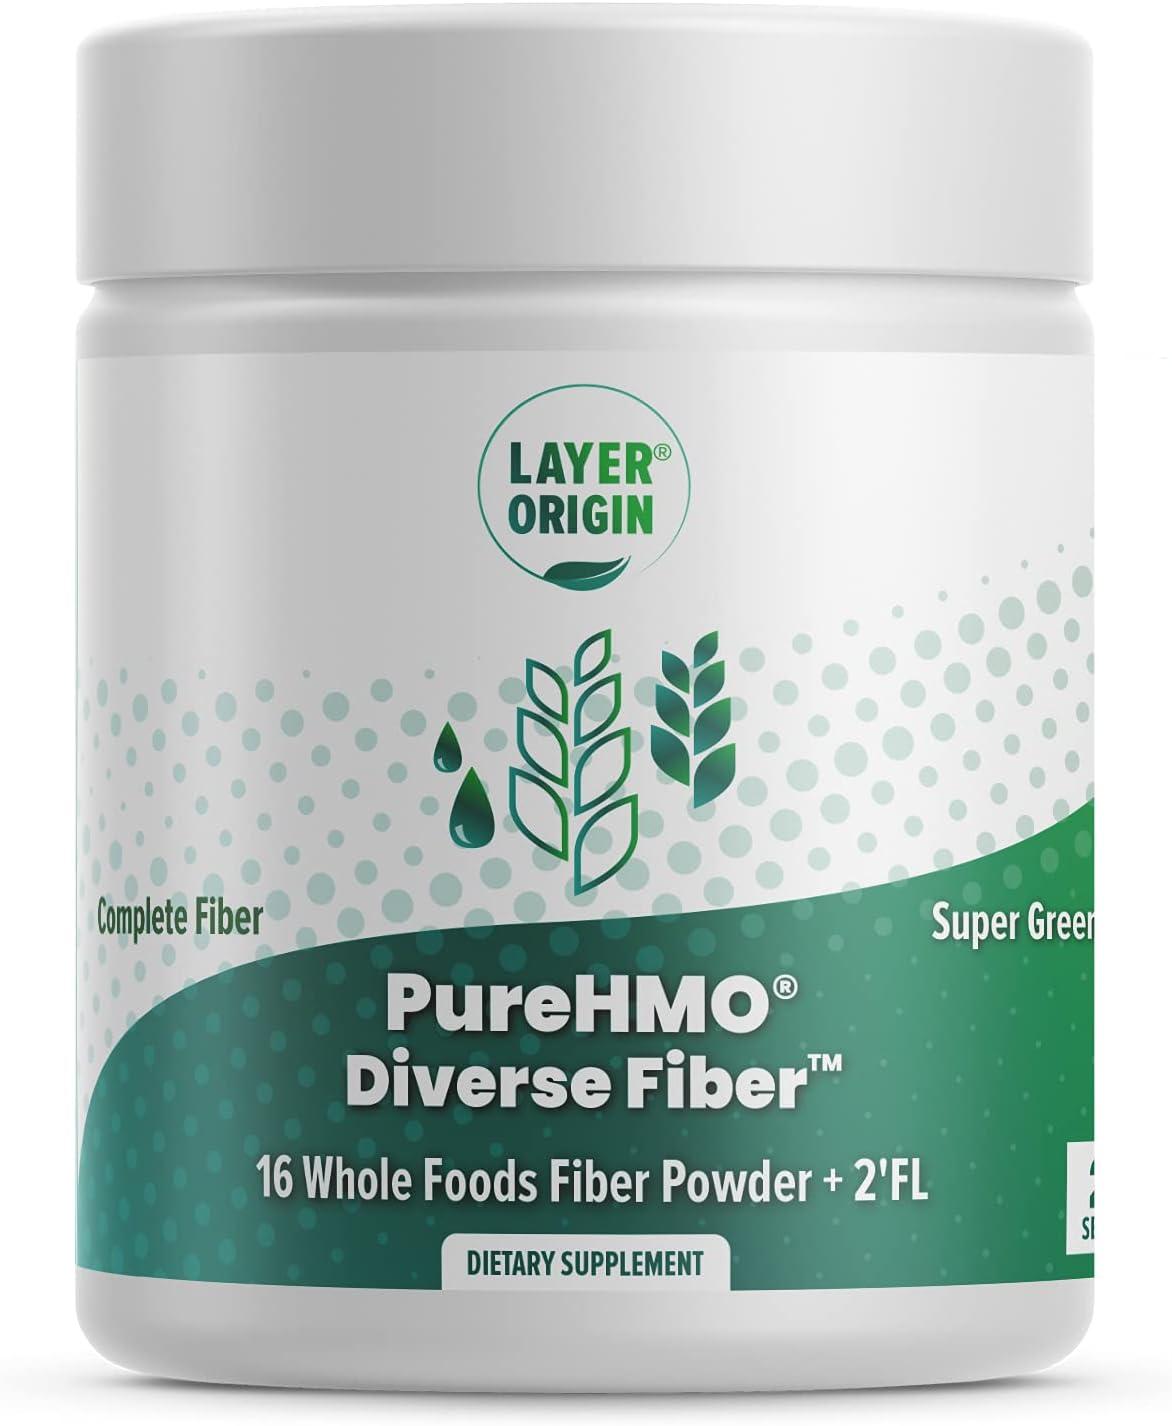 Layer Origin | PureHMO Diverse Fiber 16 Whole Foods Fiber Powder | Human Milk Oligosaccharide 2'-FL Prebiotic | Psyllium Husk, Chicory Root, Acacia Fiber, Apple Peel, Pea Fiber | 2'-Fucosyllactose